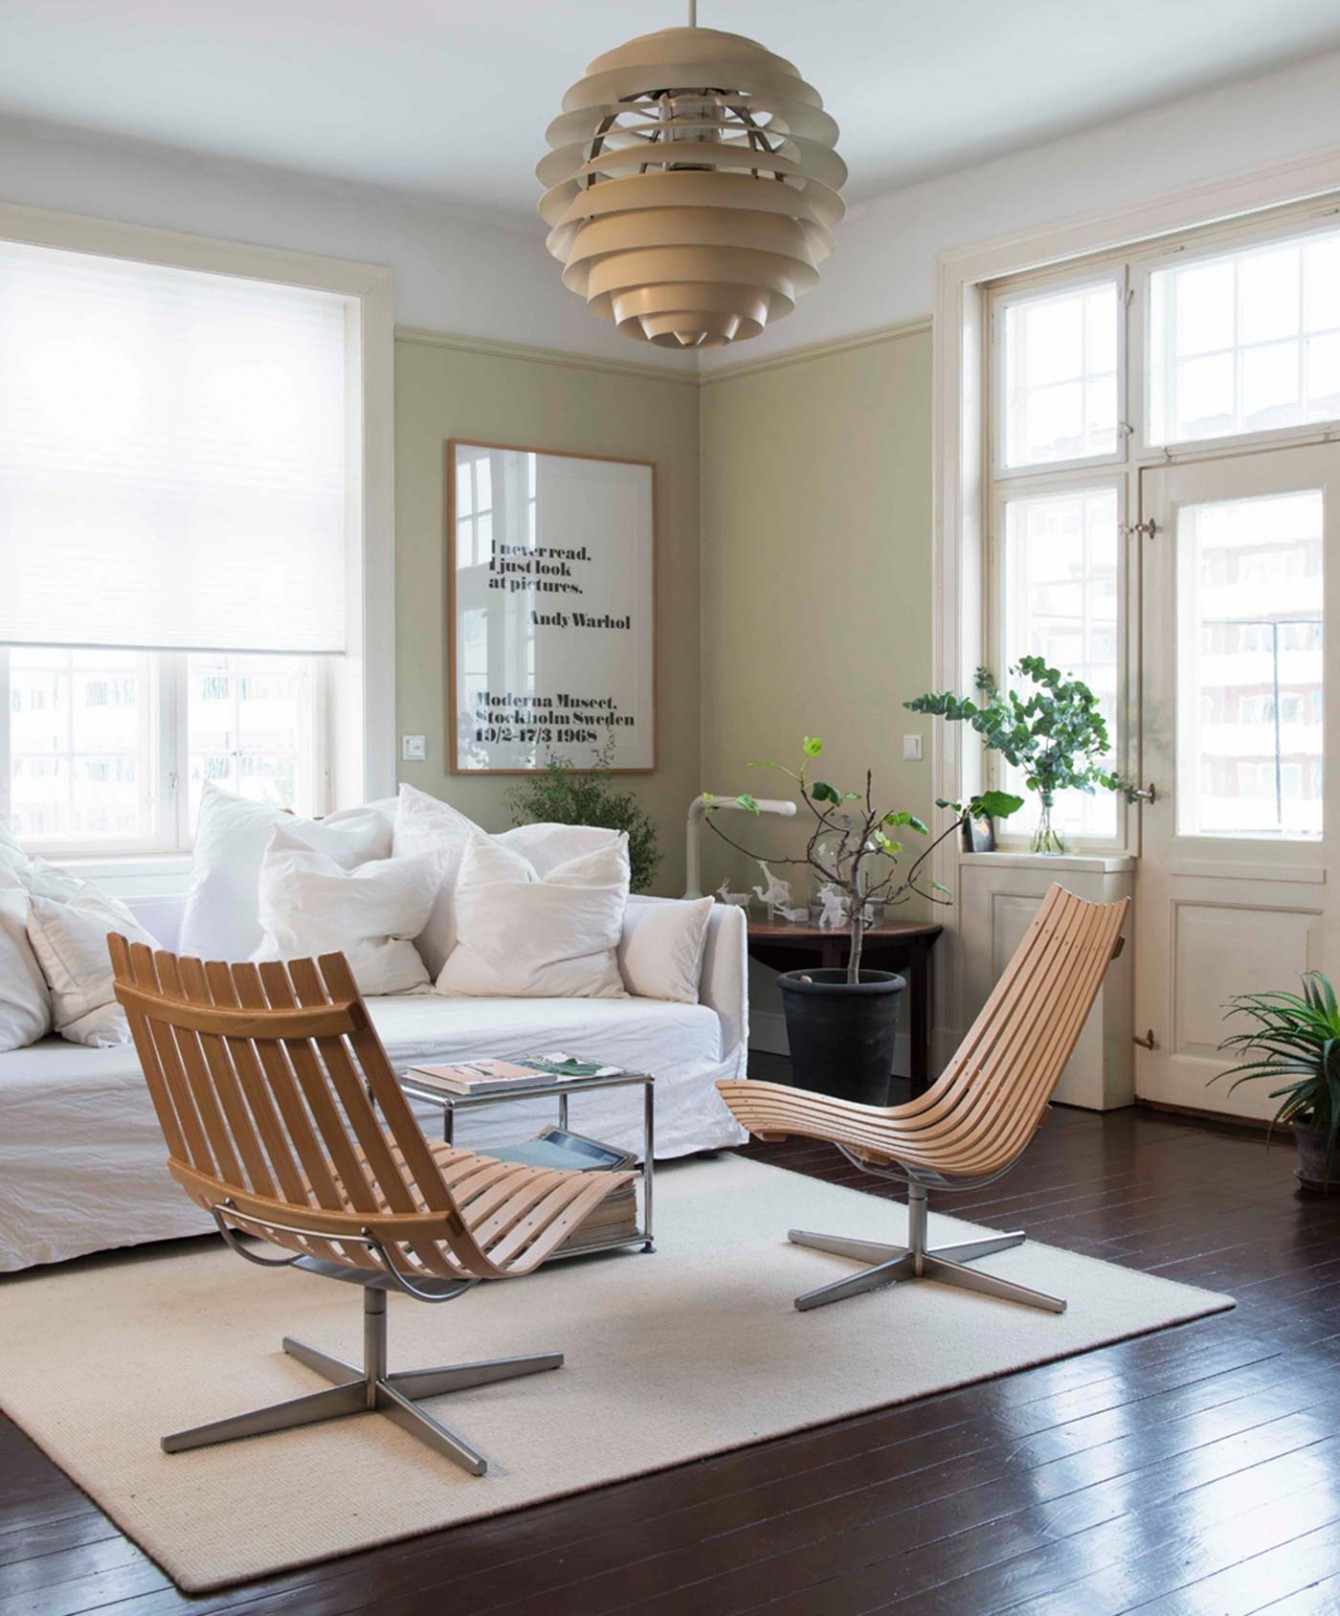 scandia-nett-swivel-lounge-chair